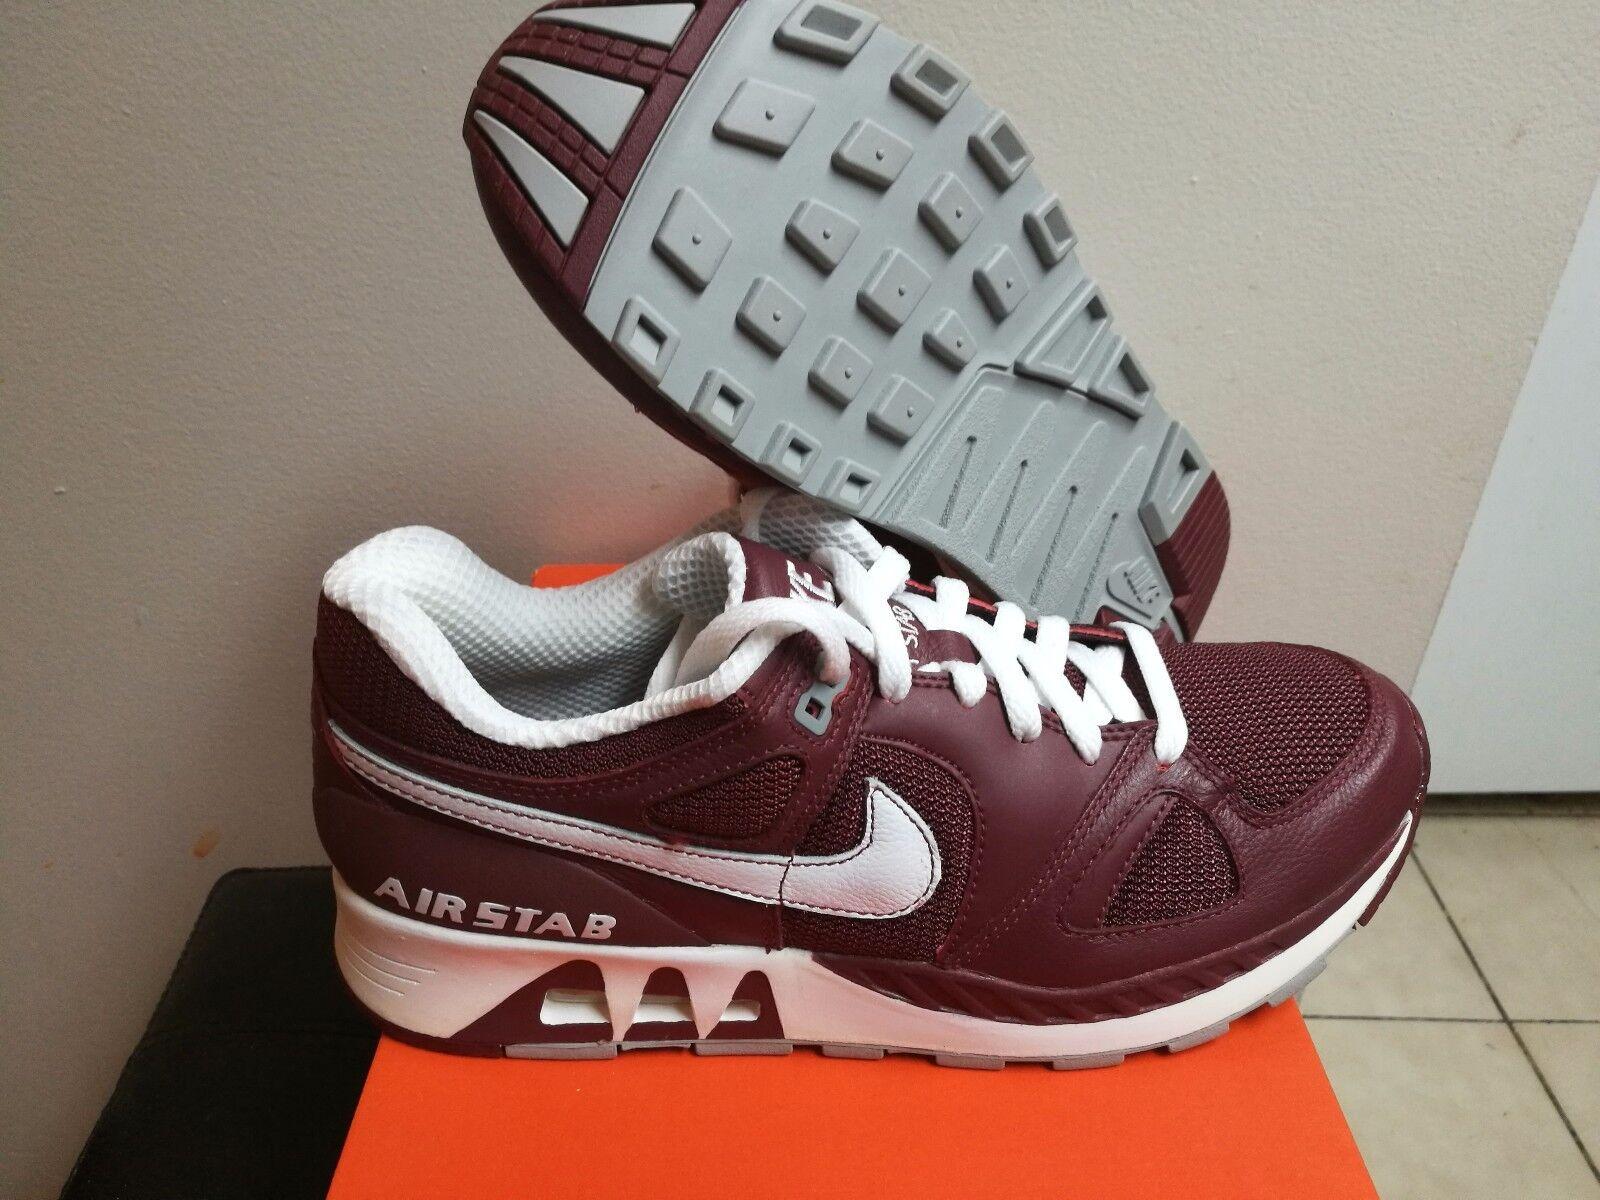 Men's Nike Air Stab Red Earth White Medium Grey 315841 611 Size 9.5